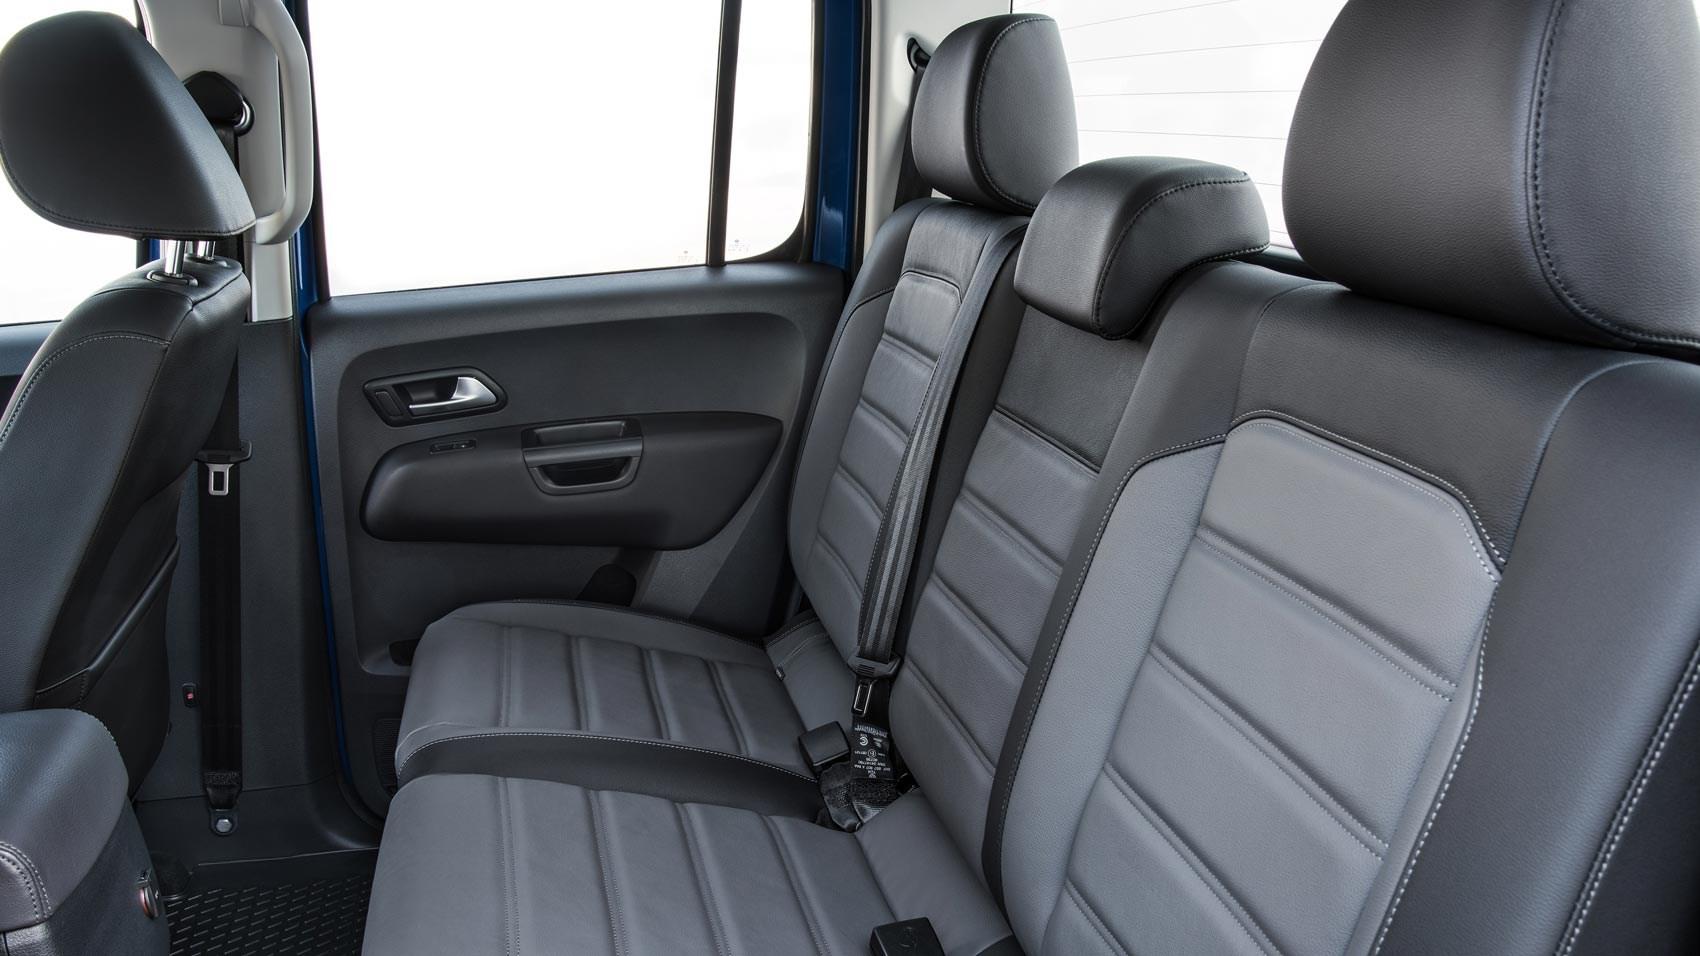 Volkswagen Amarok V6 Aventura 4x4 (2017) review   CAR Magazine